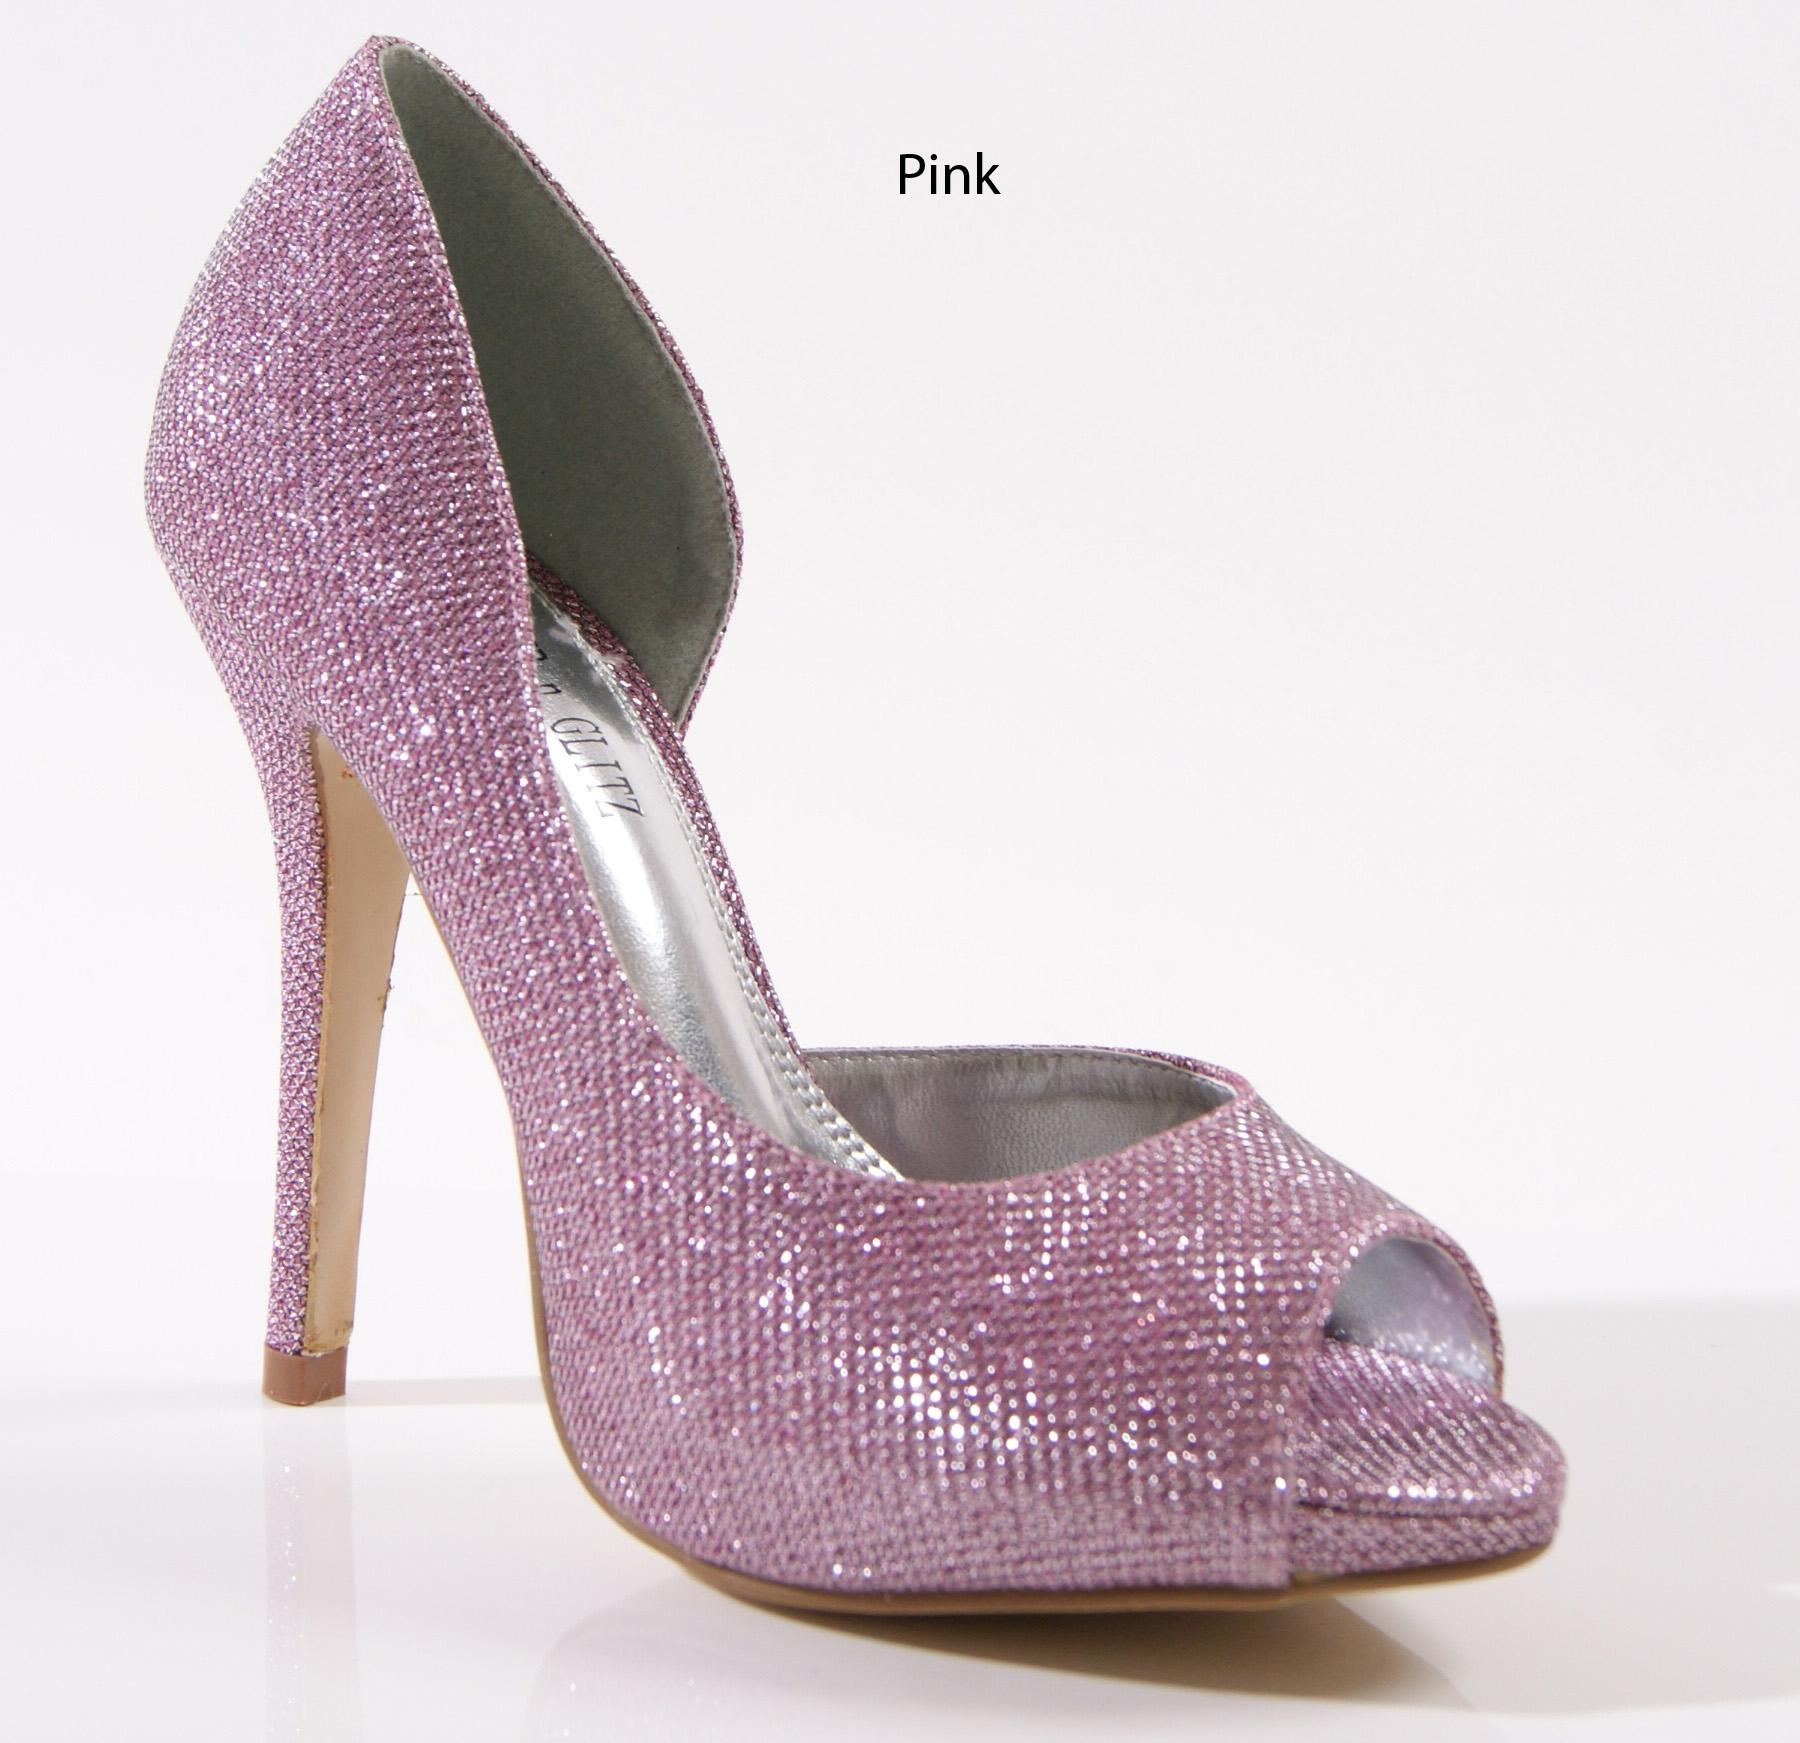 Señoras Para Mujer De Taco Alto Prom De Boda nupcial Peep Toe De Sandalias Zapatos Talla